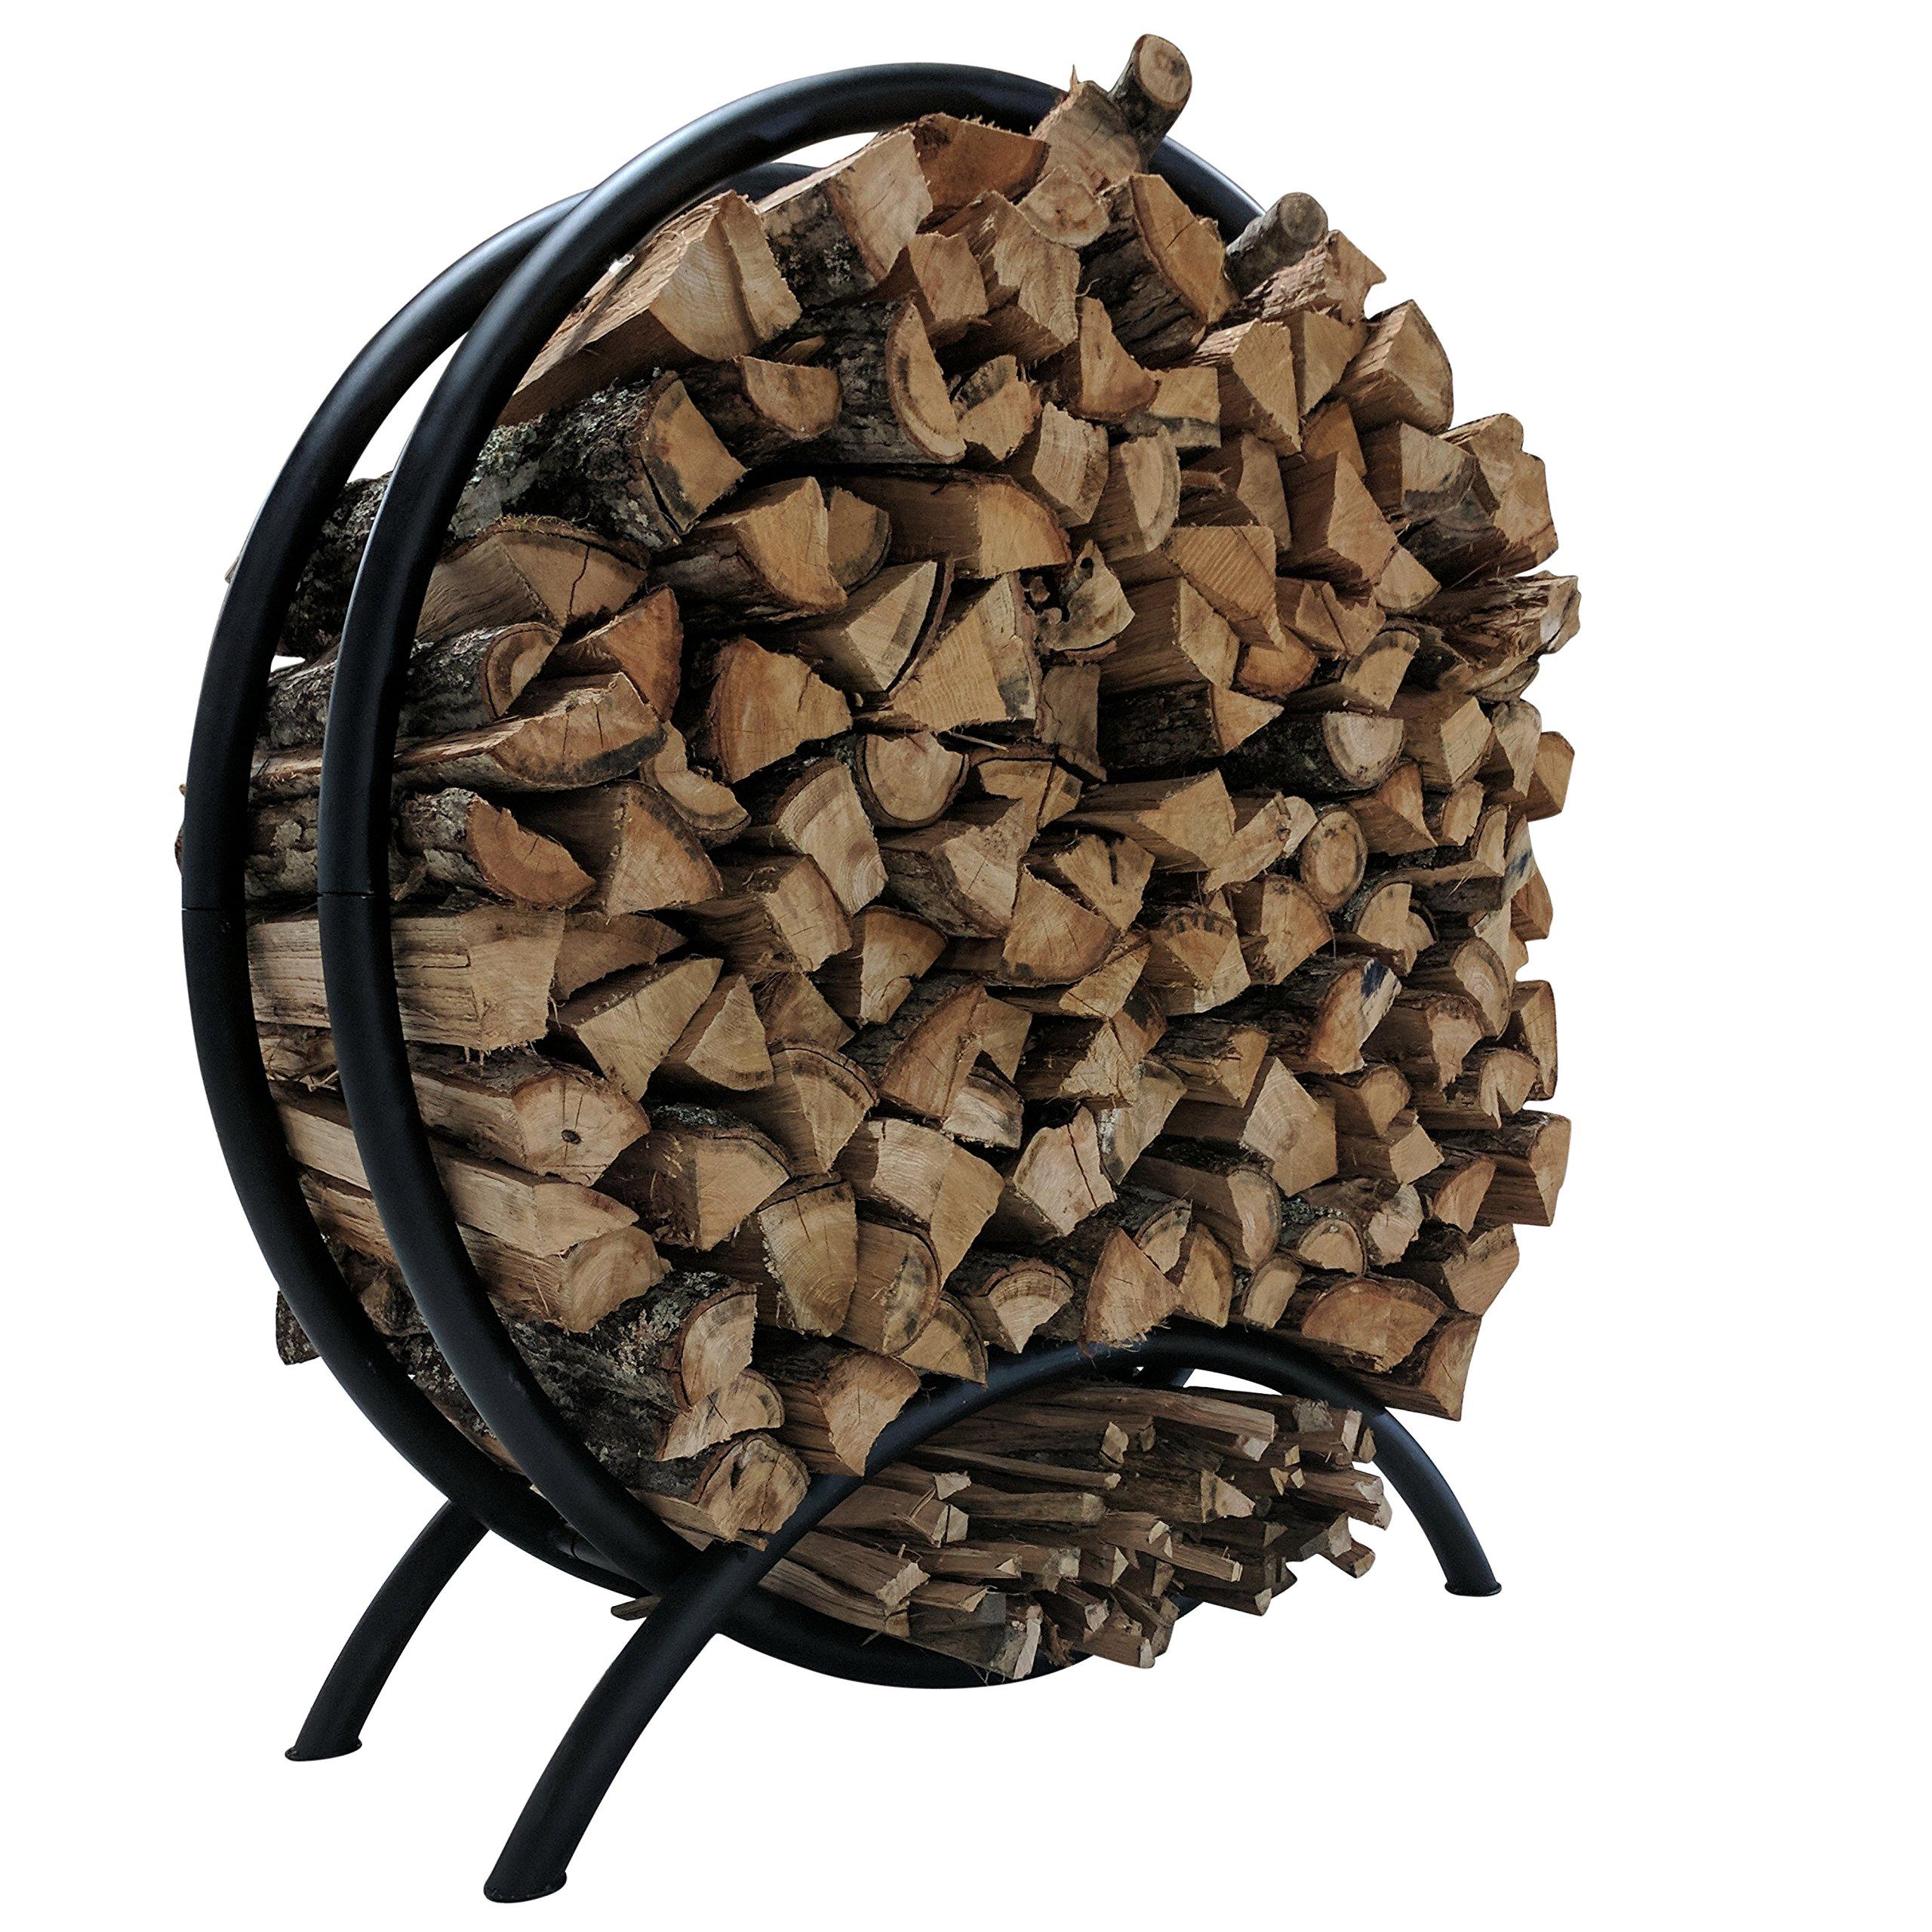 Titan Heavy Duty Firewood Log Rack (54'' Circular)